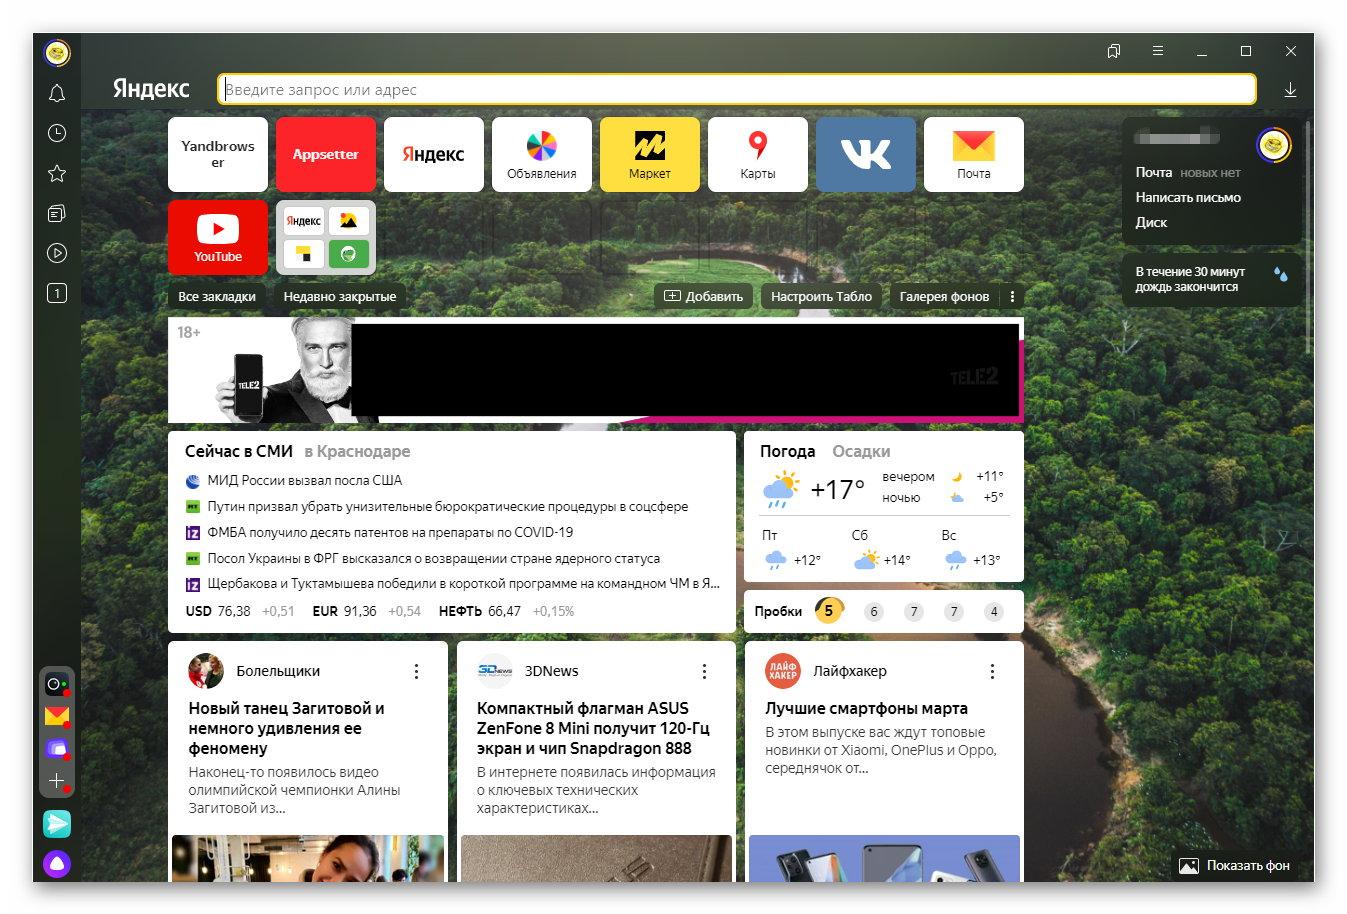 Главный экран яндекс браузера